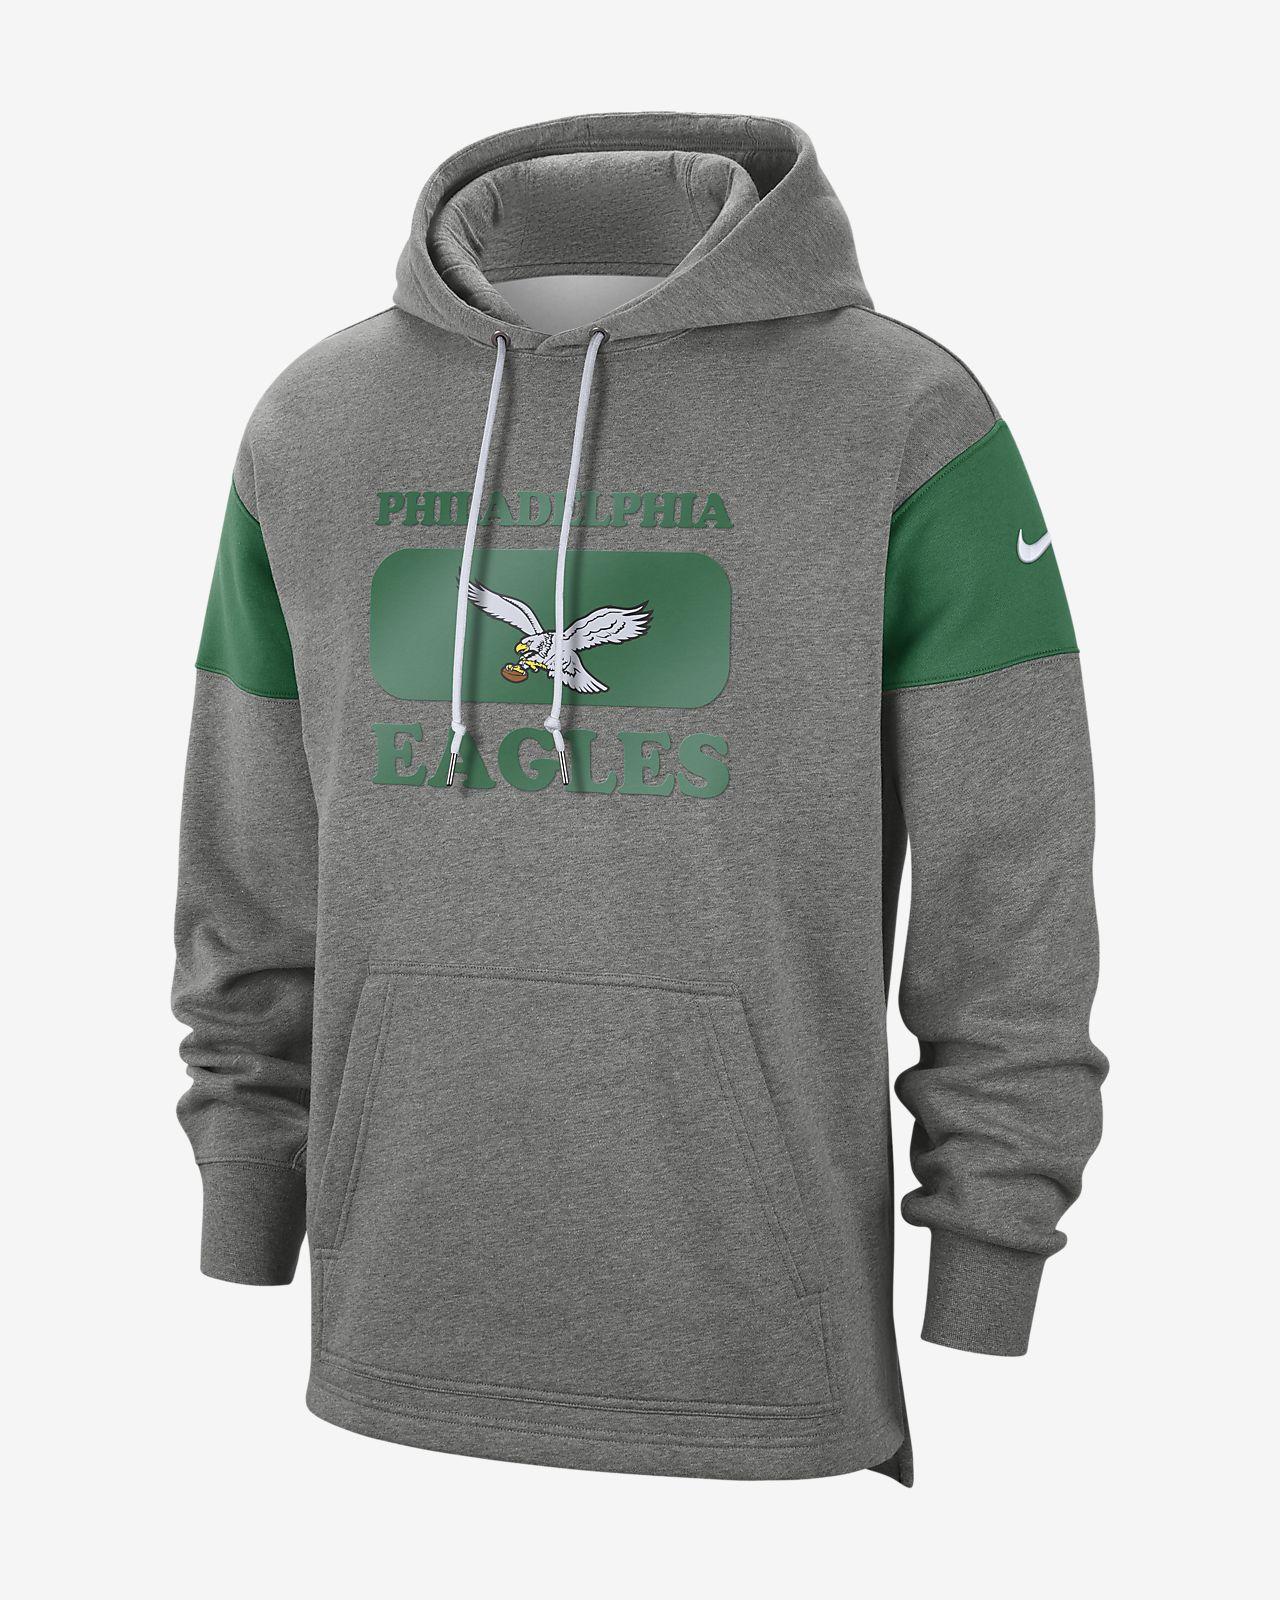 big sale 1dabc 47598 Nike (NFL Eagles) Men's Hoodie